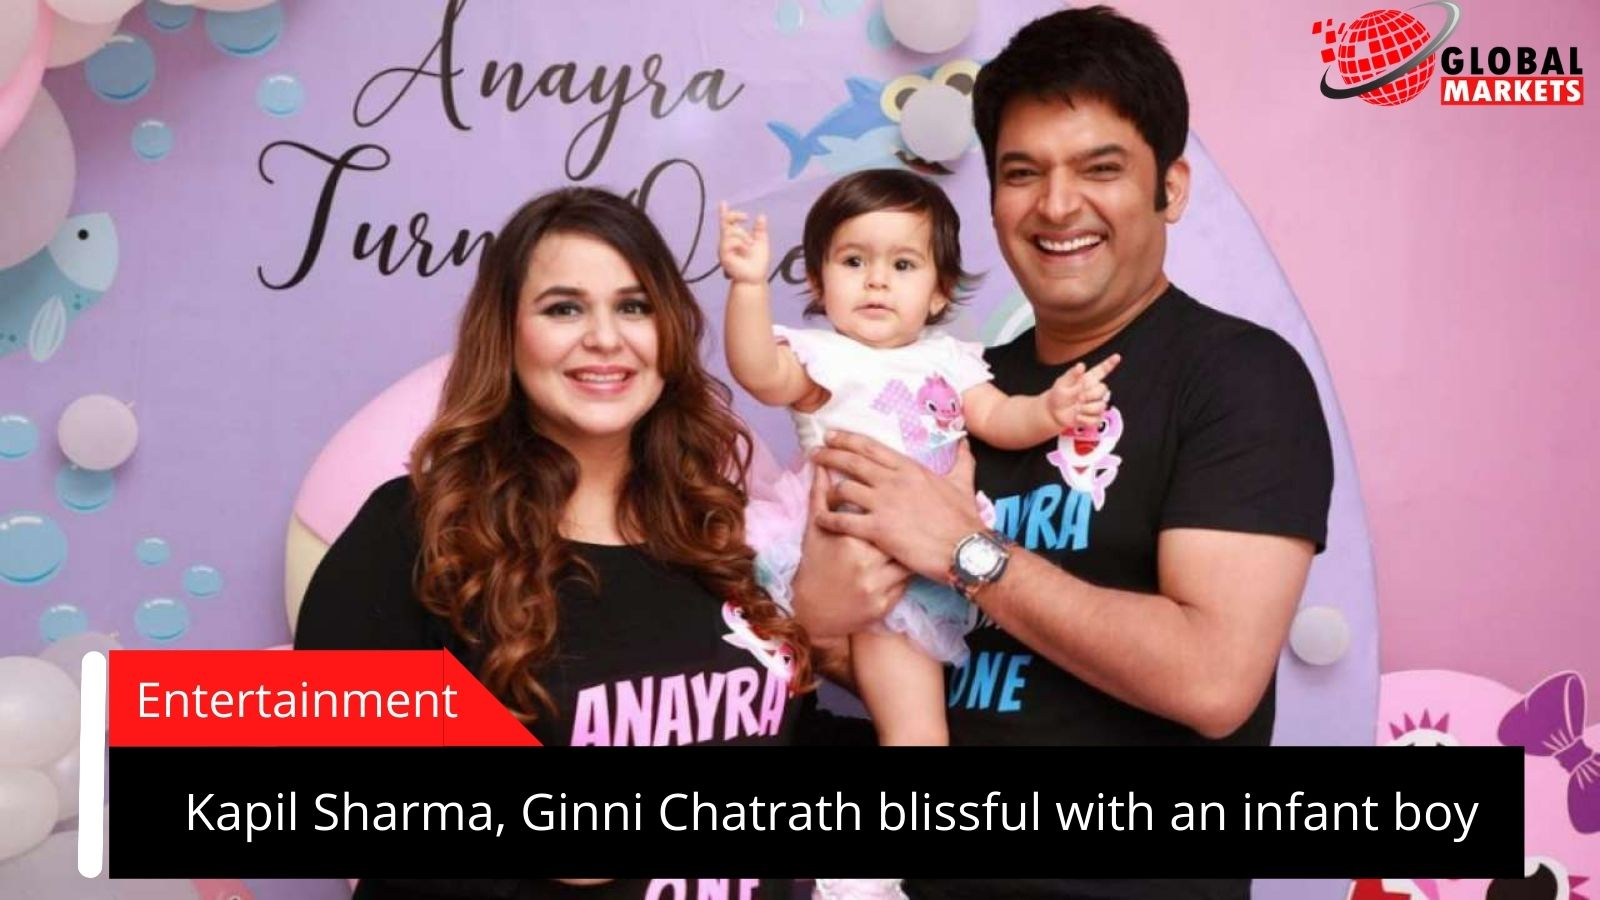 Kapil Sharma, Ginni Chatrath blissful  with an infant boy